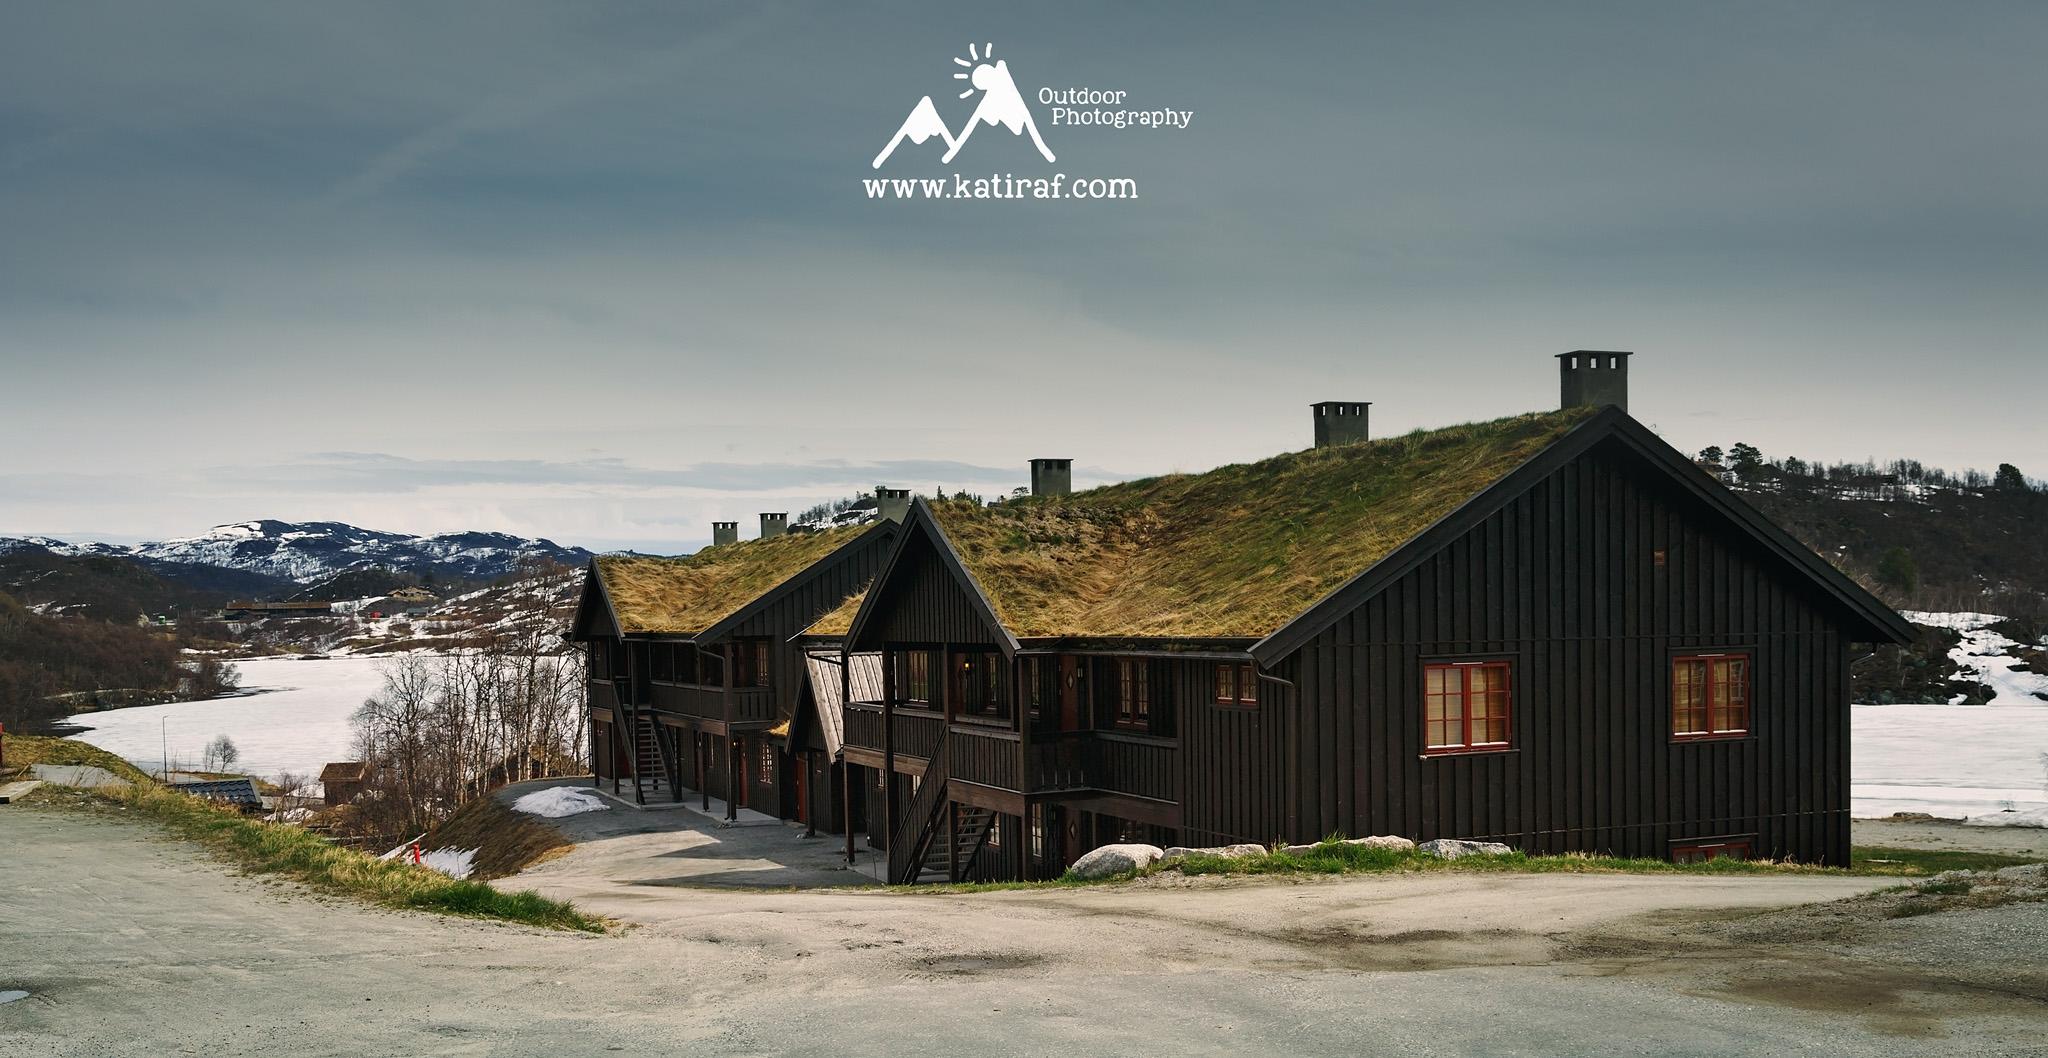 katiraf-norwegia-E134-drogi-norweskie-stavanger-oslo